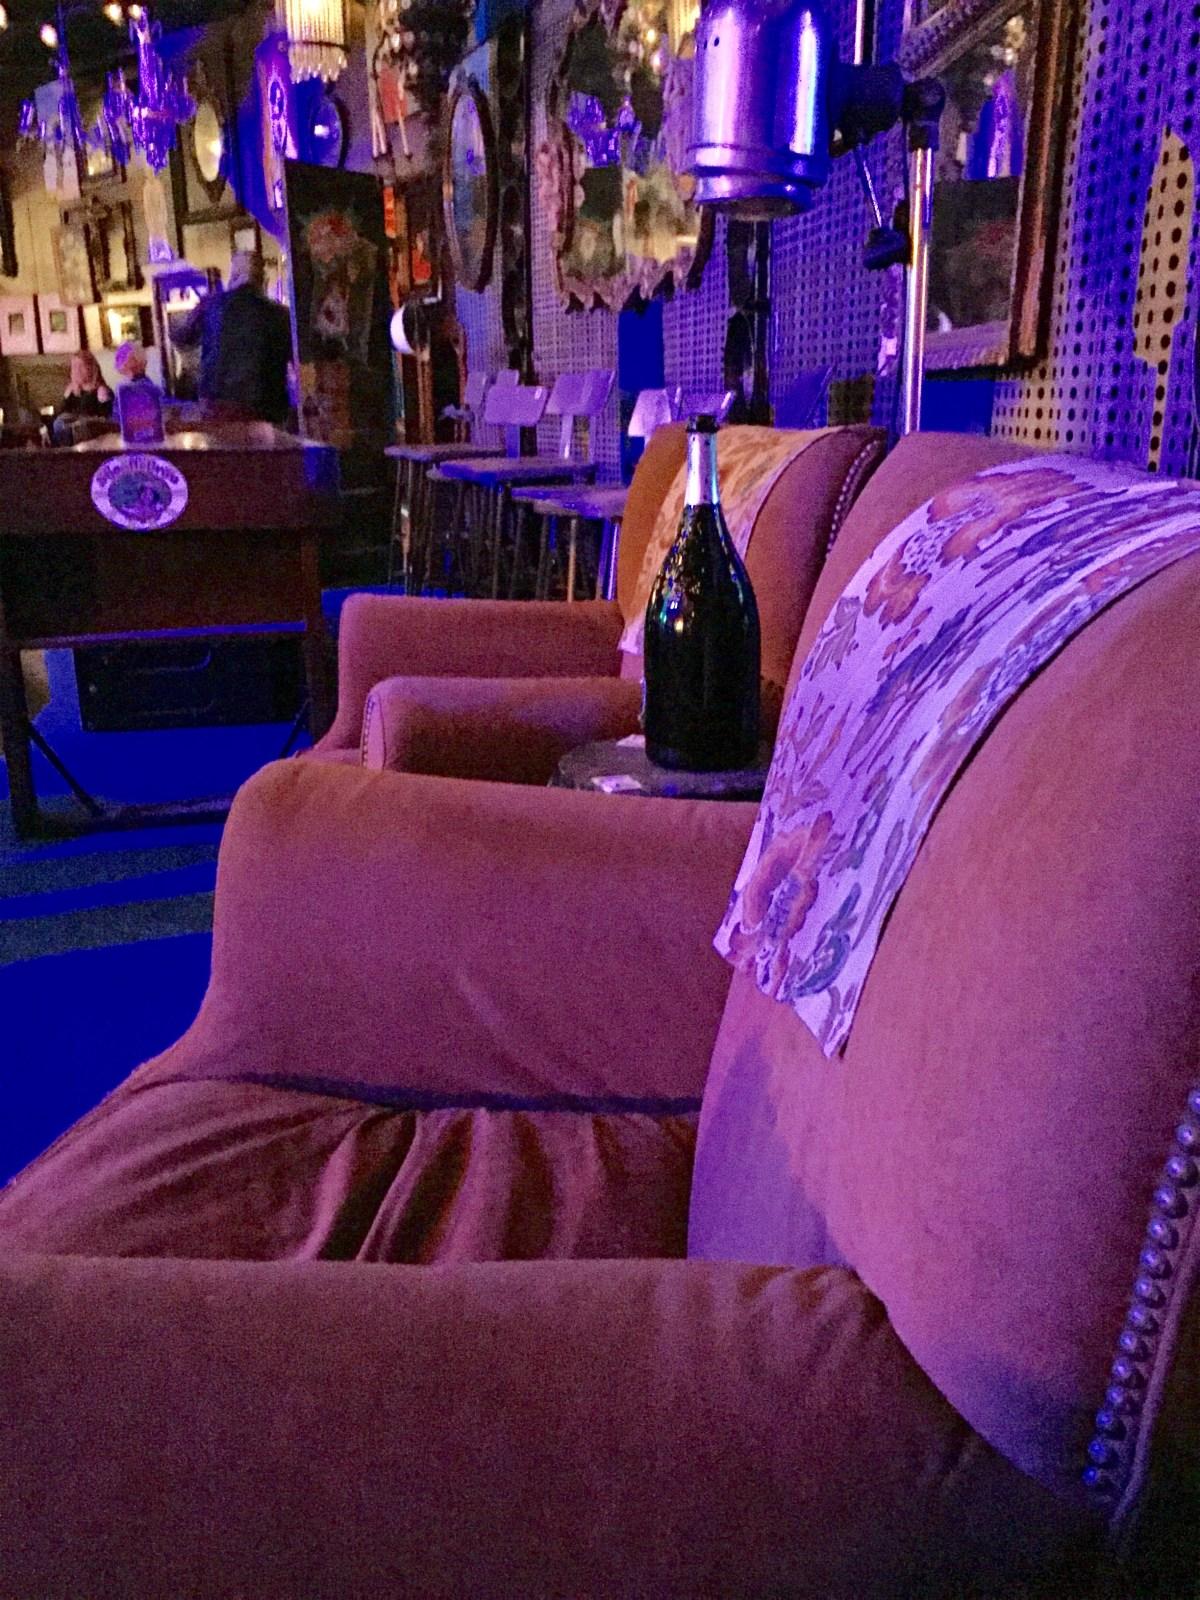 Absinthe Las Vegas #absinthe #absintheshow #absinthelasvegas #lasvegas #caesars